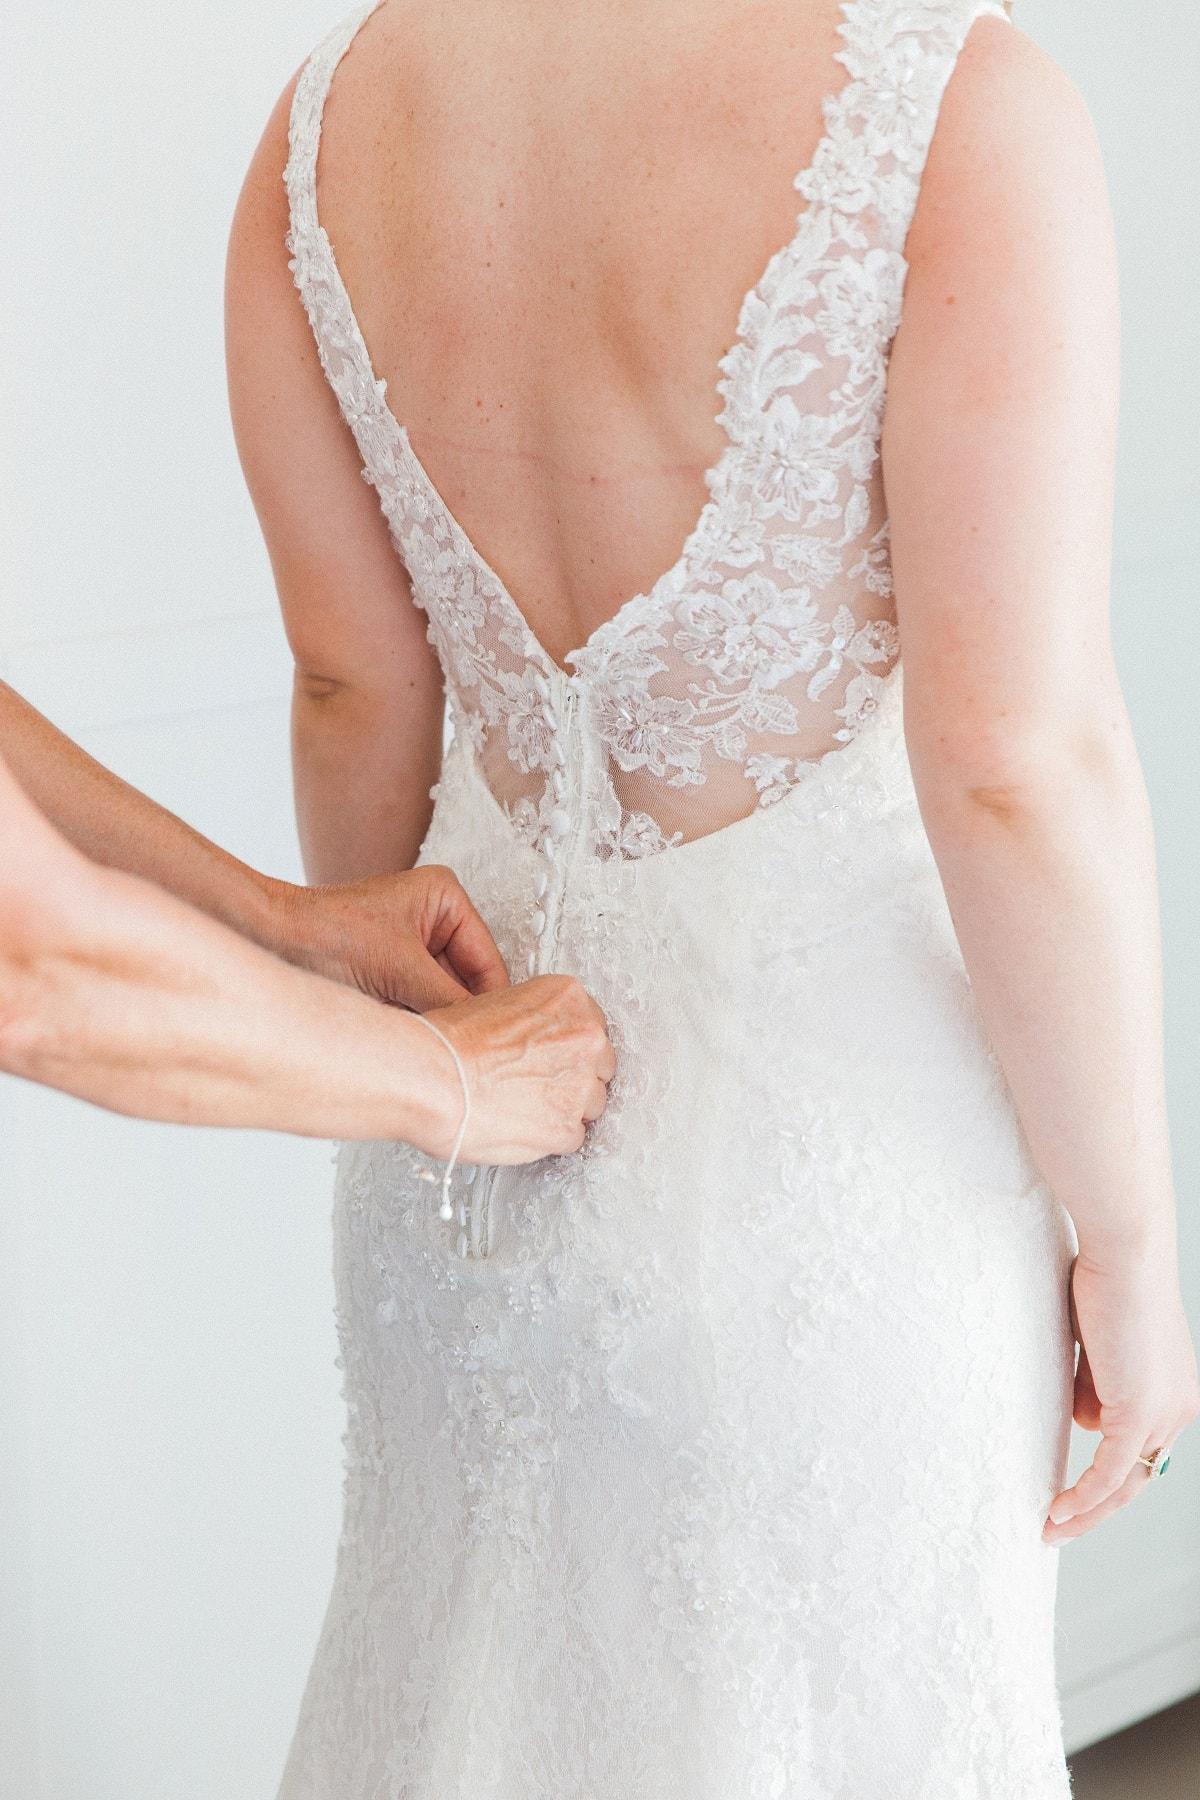 Bride Getting Ready - Greek Wedding Abroad | Planned by Lefkas Weddings | Maxeen Kim Photography